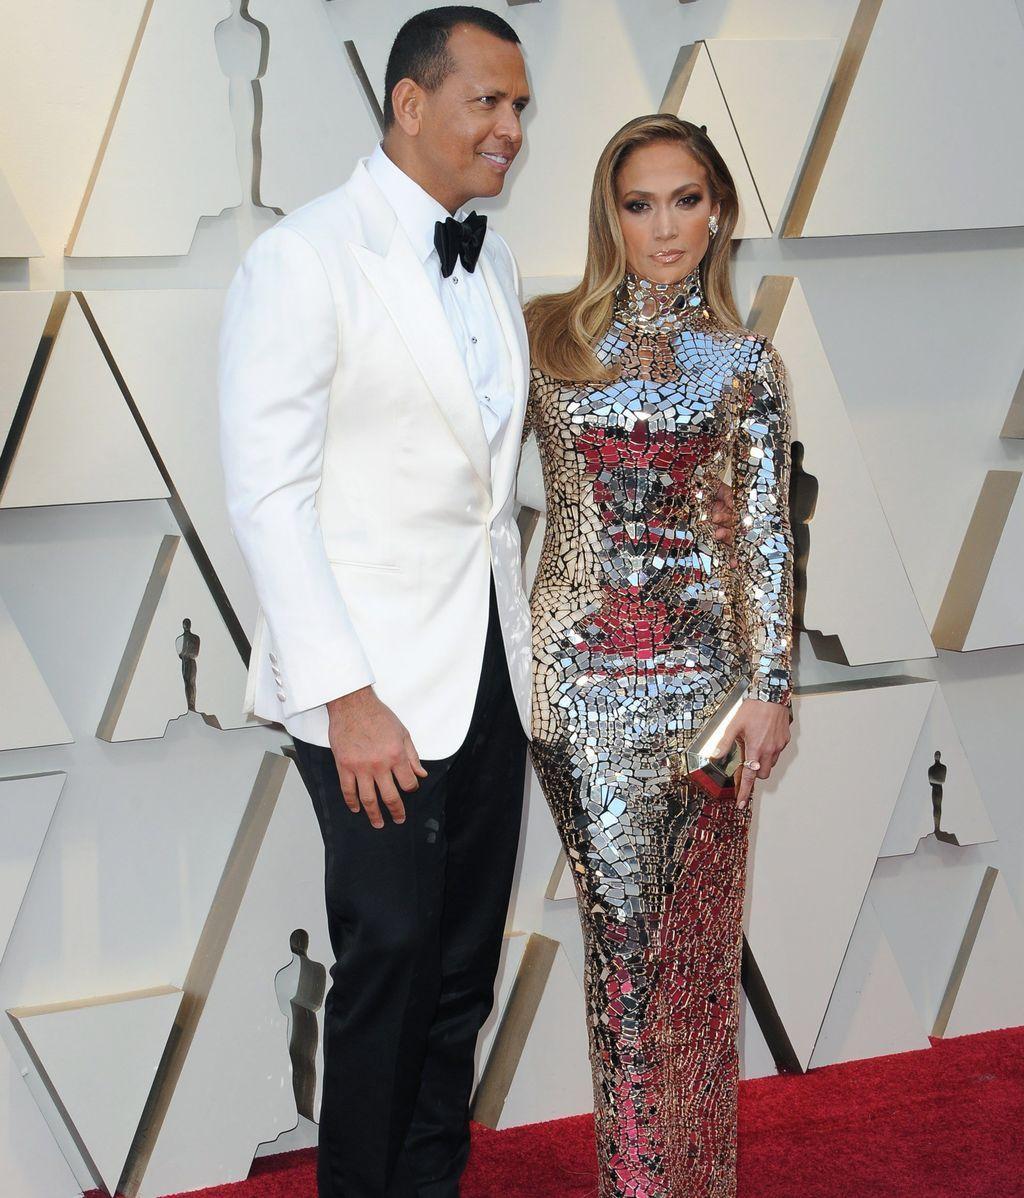 Jennifer Lopez y Alex Rodriguez eligieron a Tom Ford como diseñador